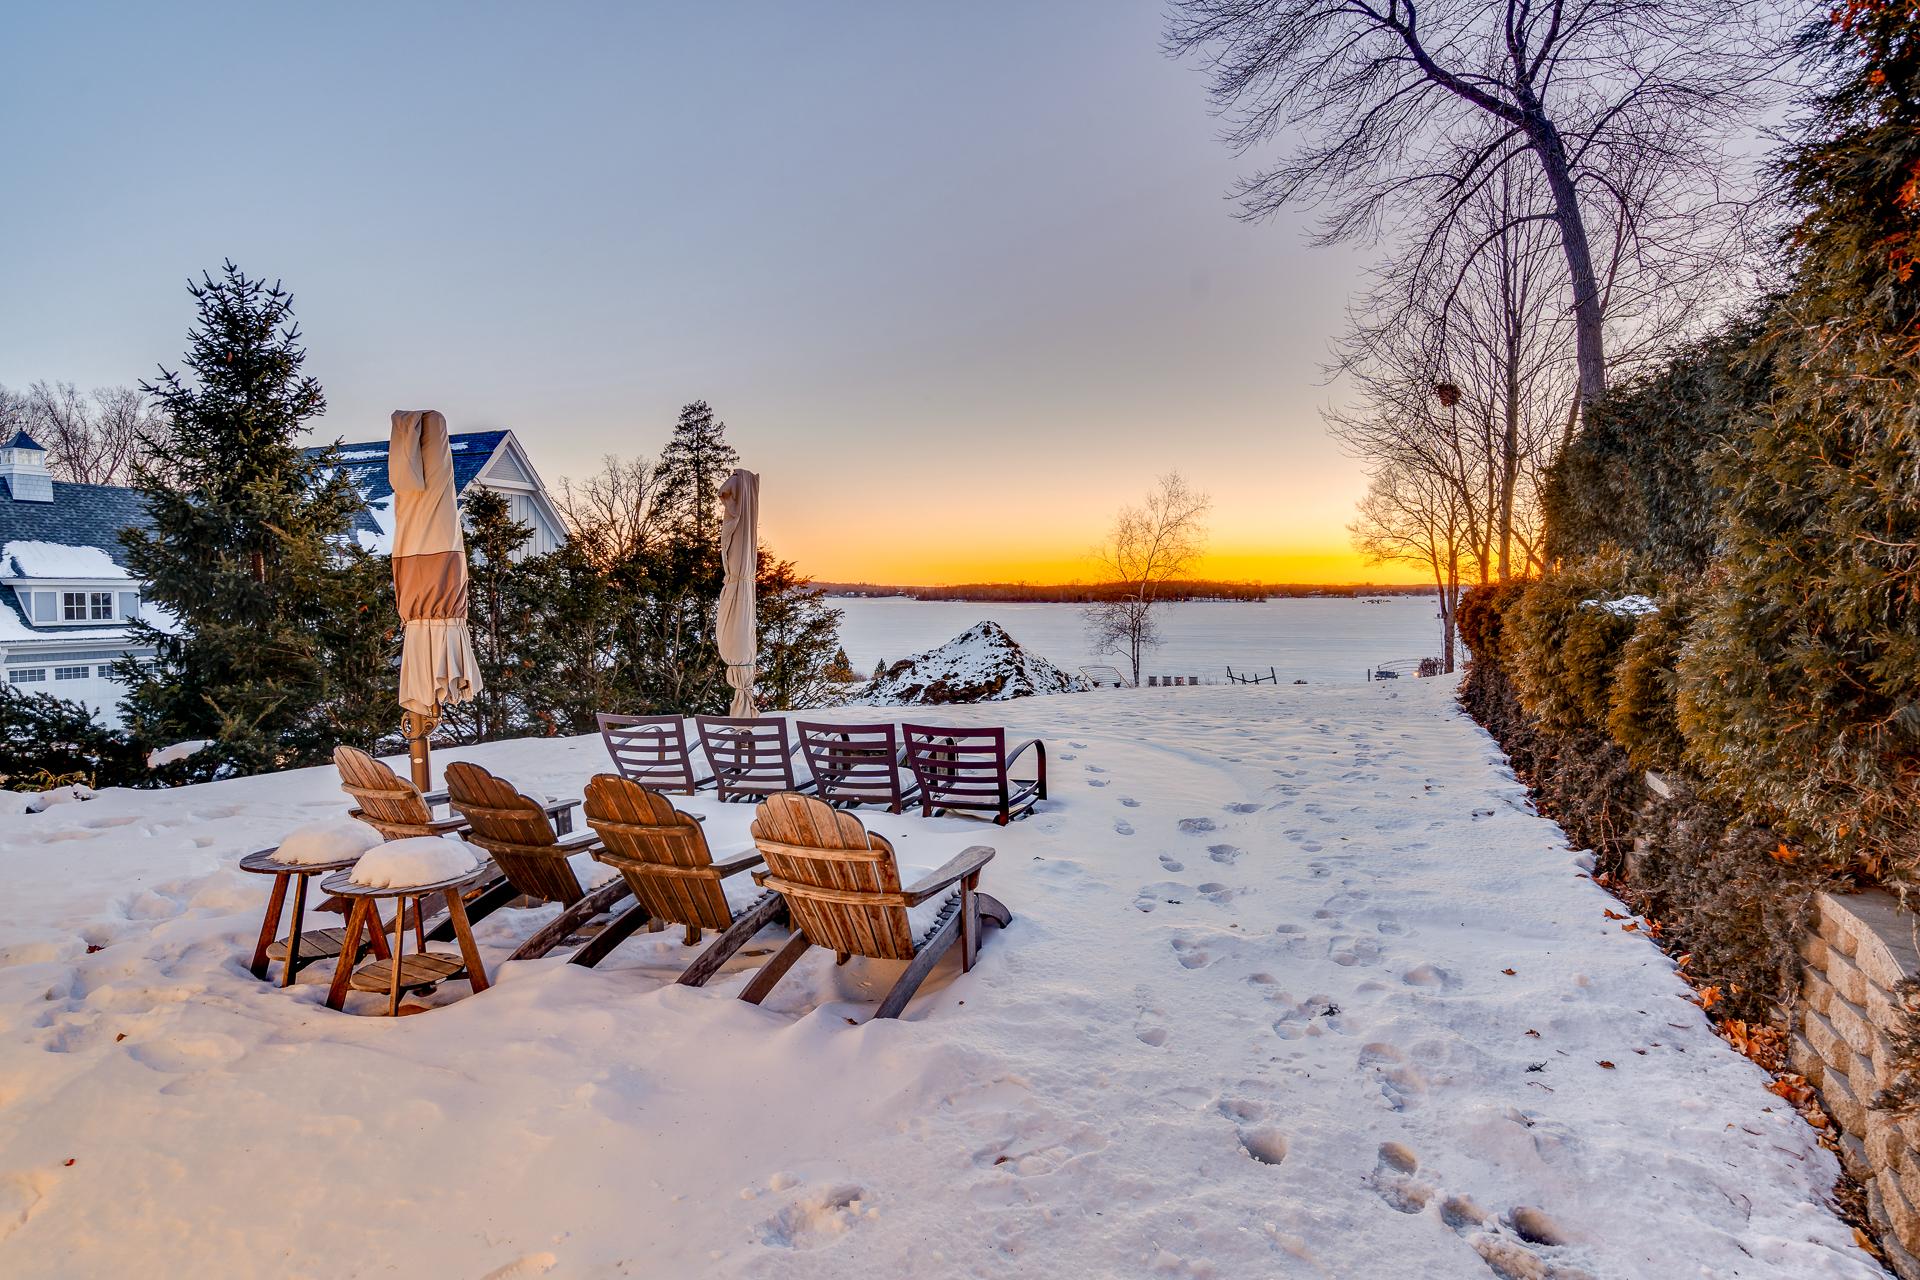 Snowy backyard with view of Lake Minnetonka from Casco Point